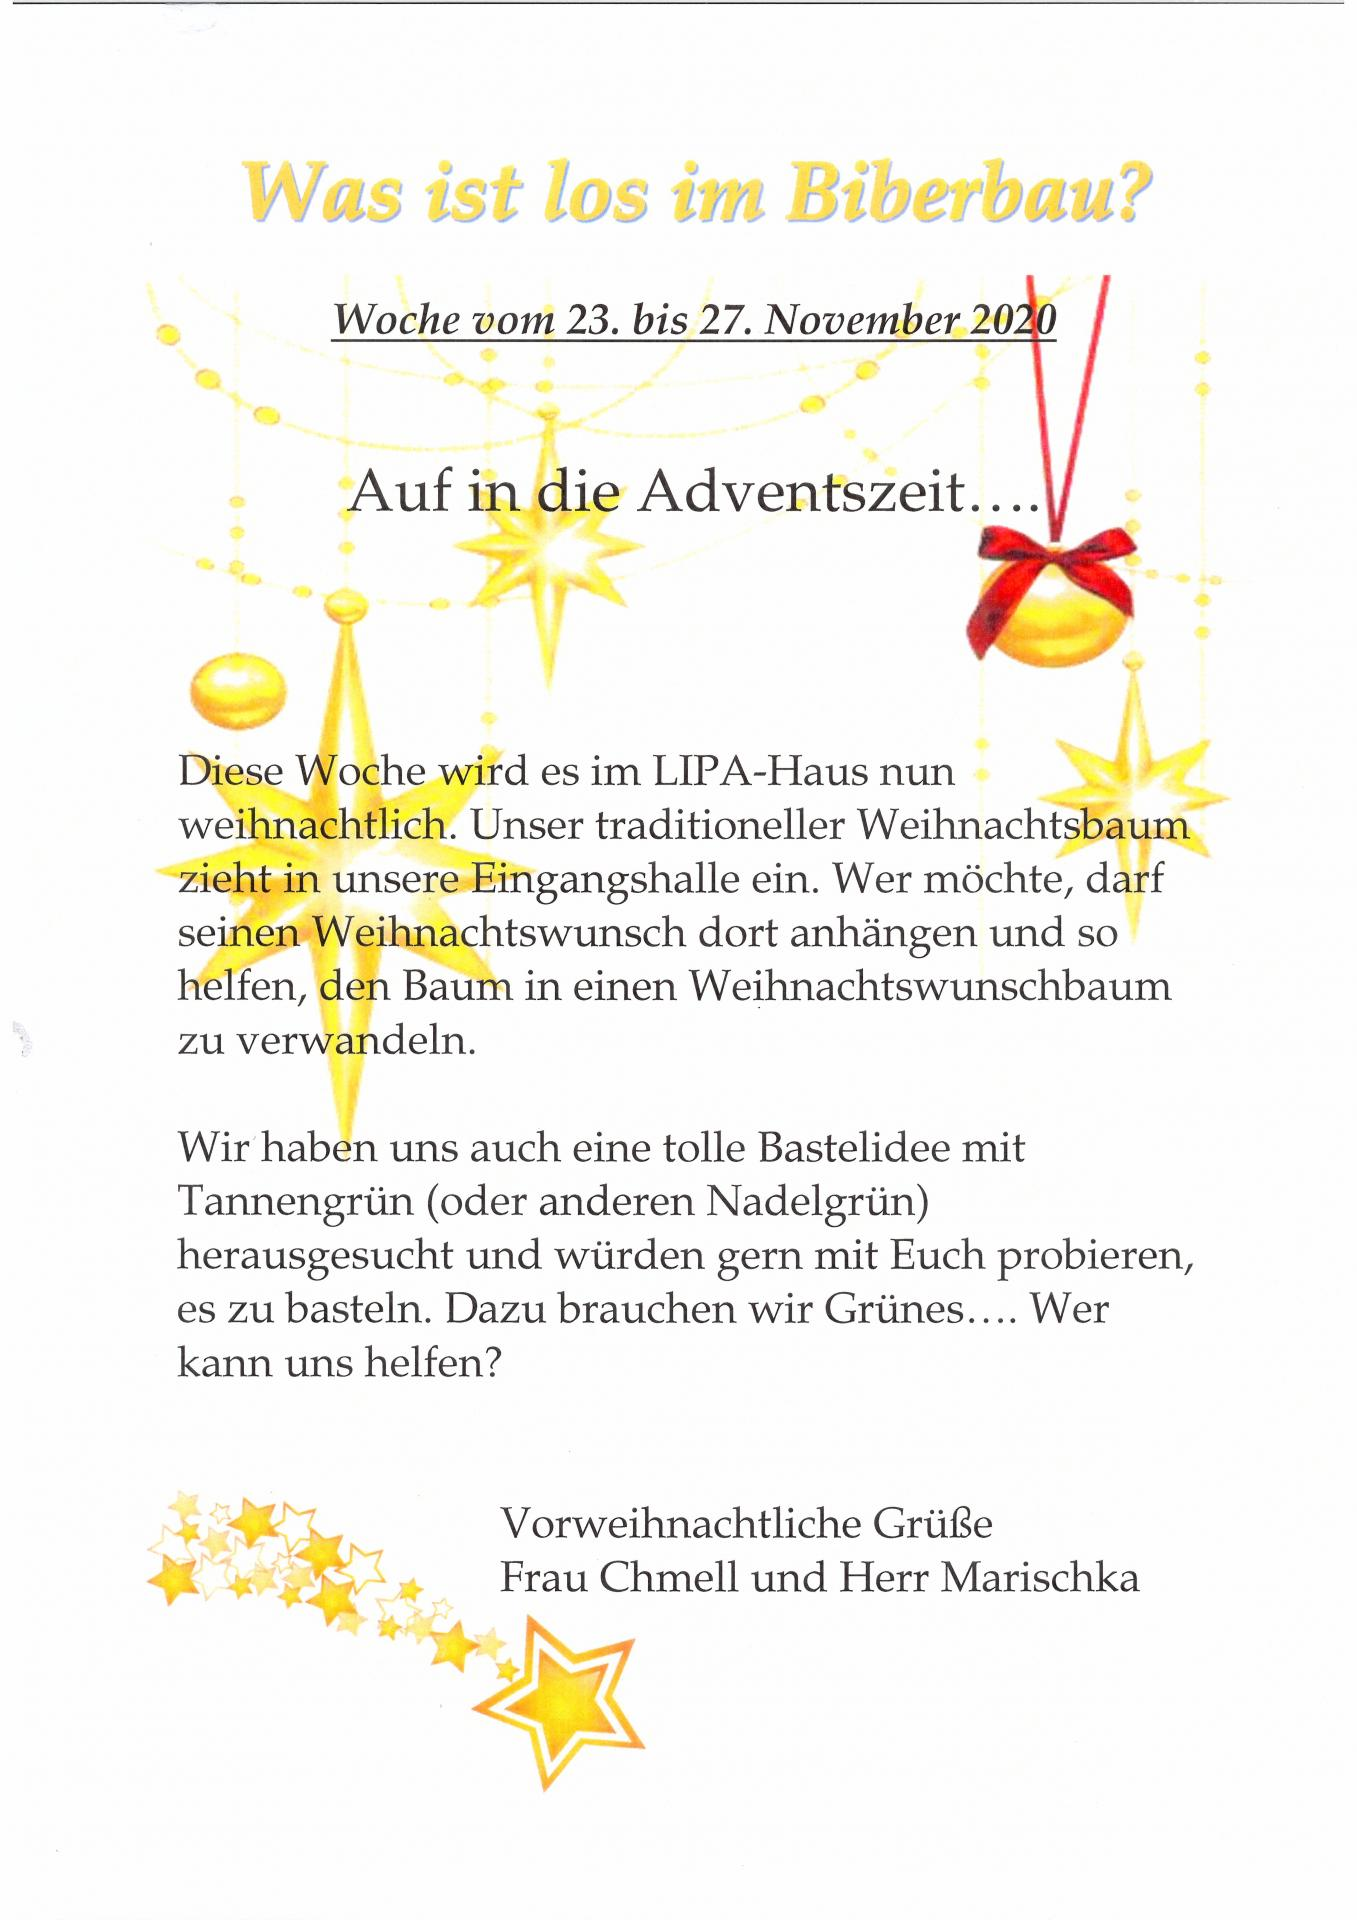 wochenplan Biber 23.11. - 27.11.2020